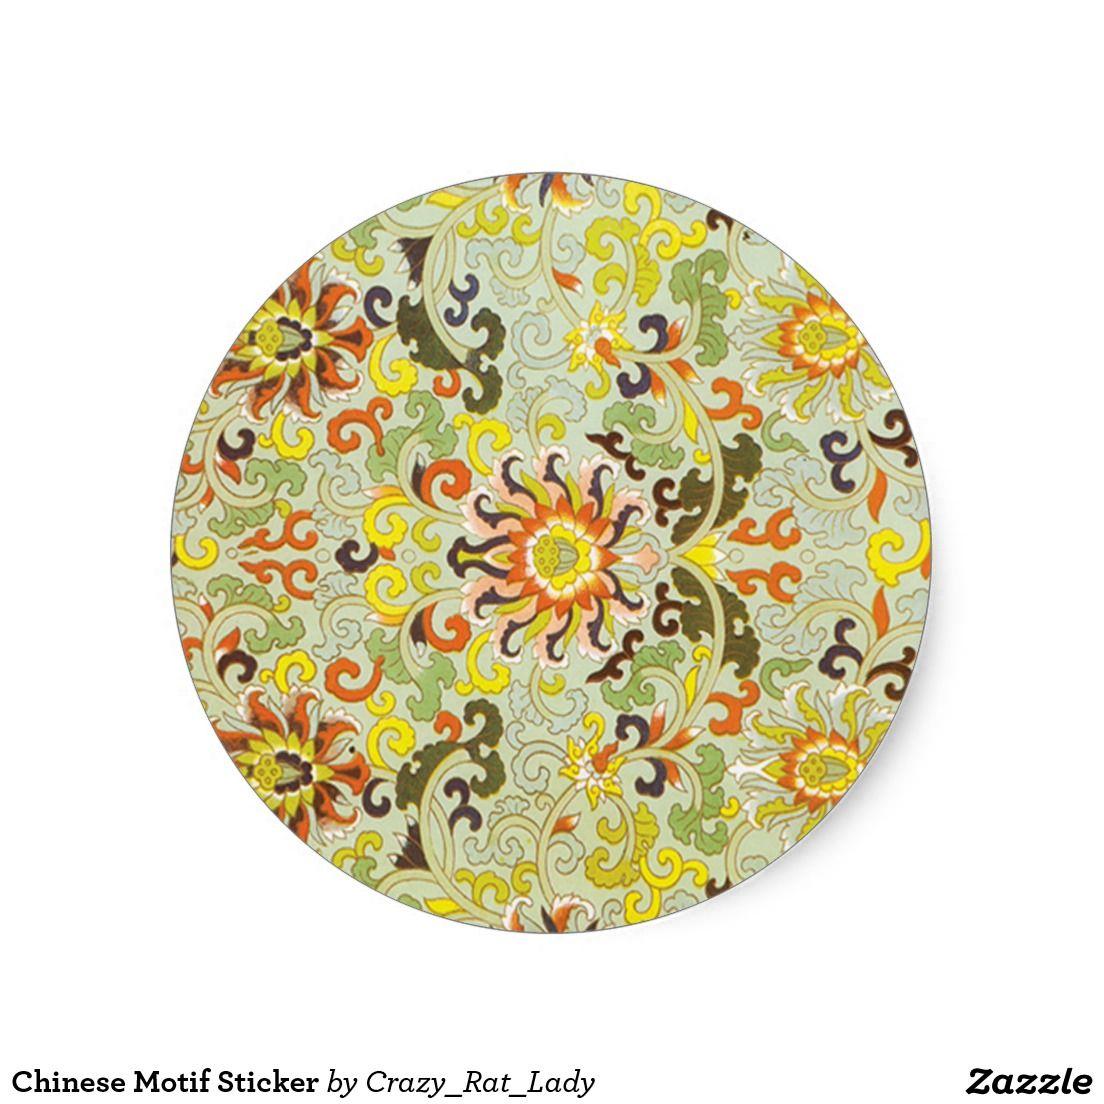 Chinese Motif Sticker